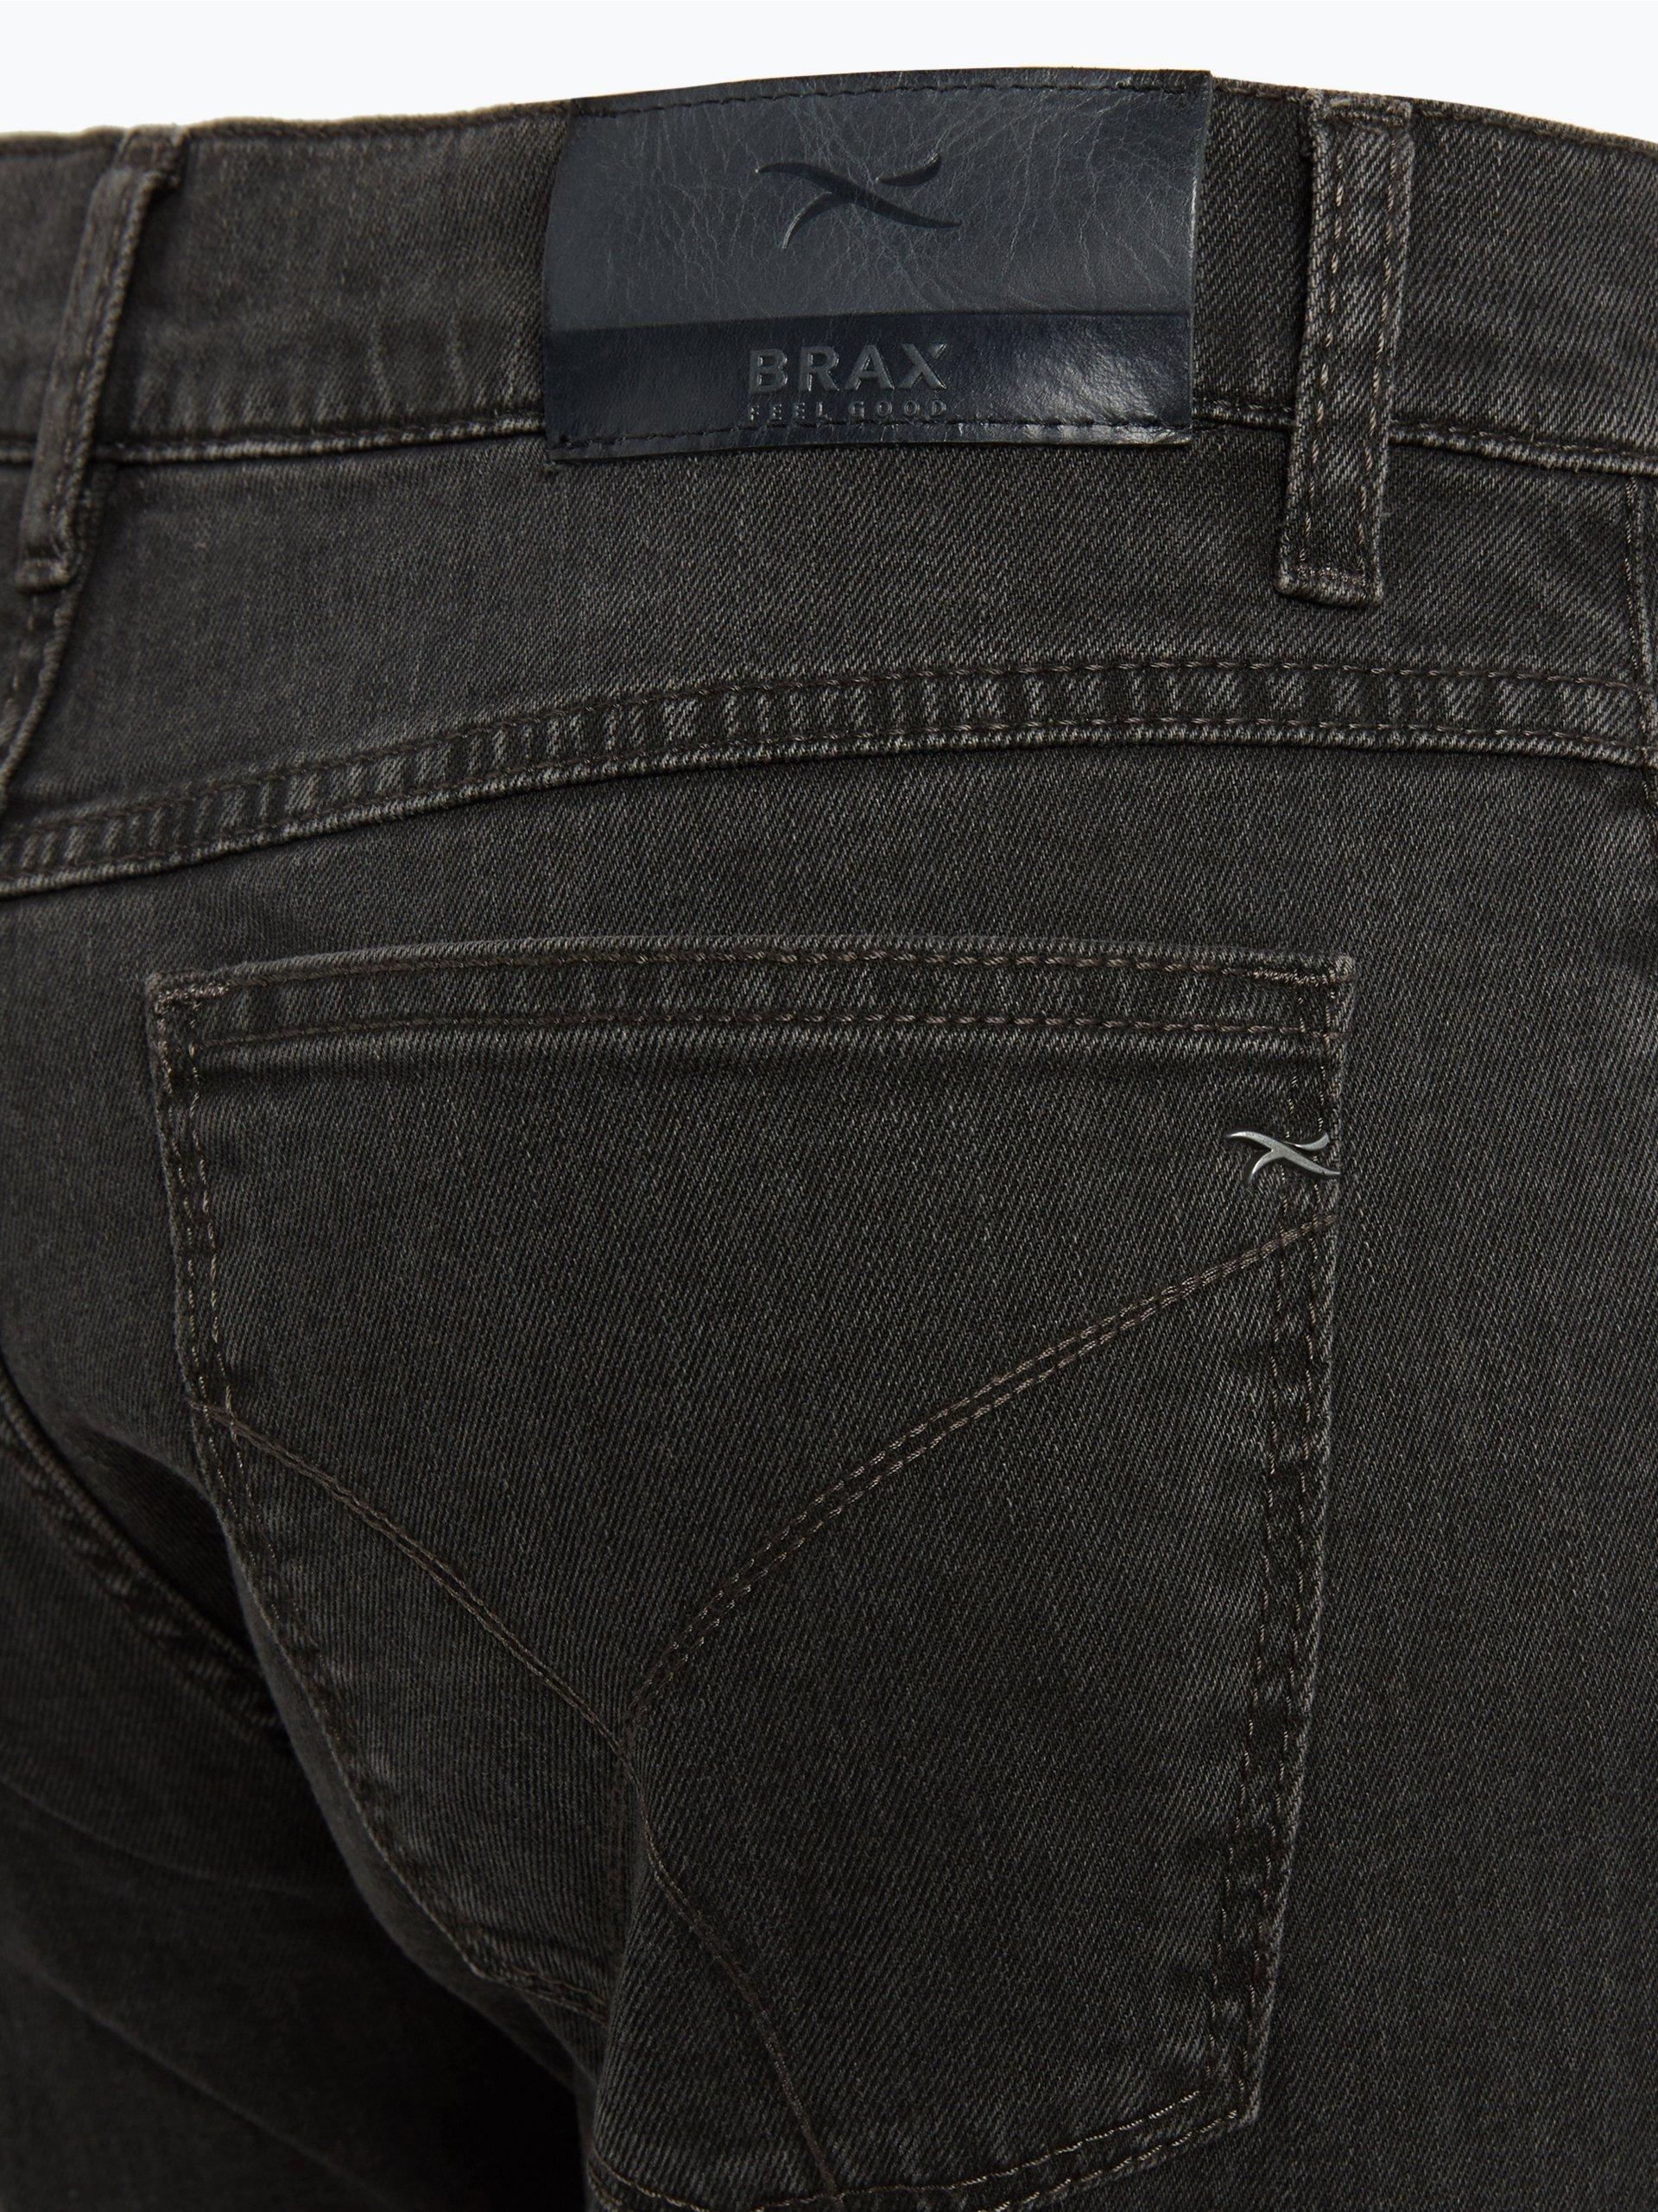 brax herren jeans cooper anthrazit uni online kaufen vangraaf com. Black Bedroom Furniture Sets. Home Design Ideas